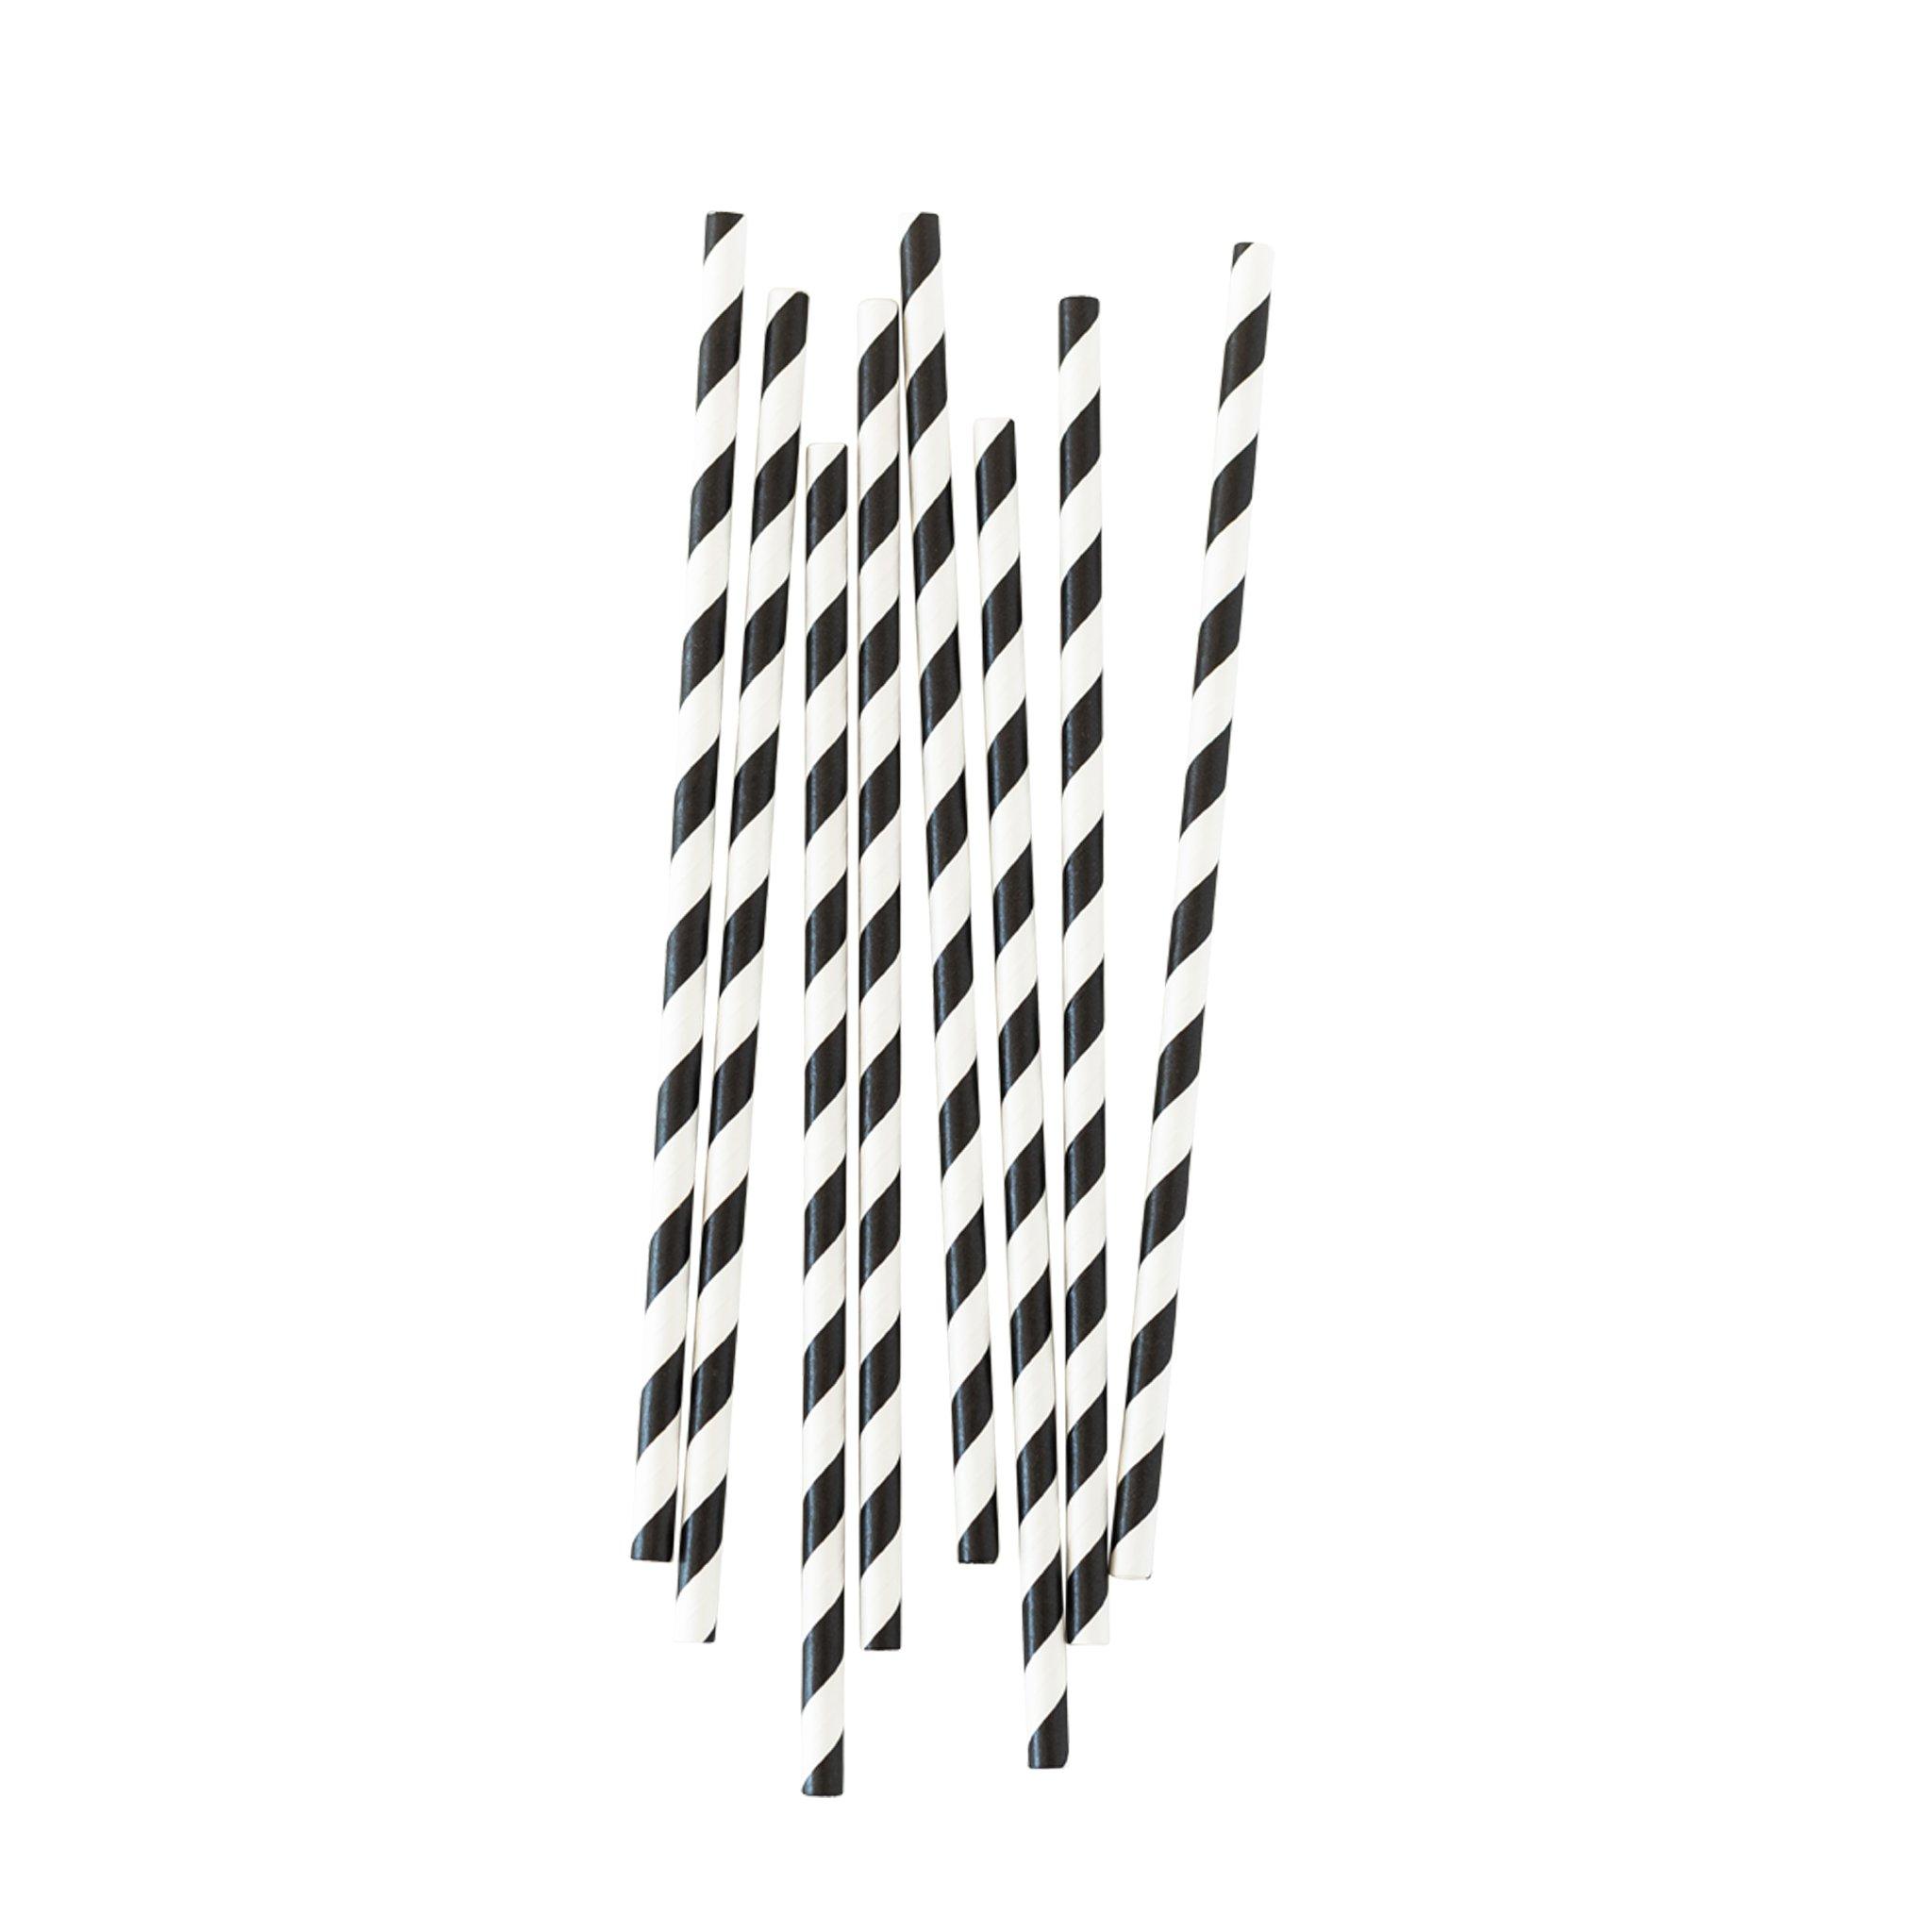 BUY ME / NEW ITEM $1.99 each Biodegradable Black & White Stripe Paper Straws - 25 Pack